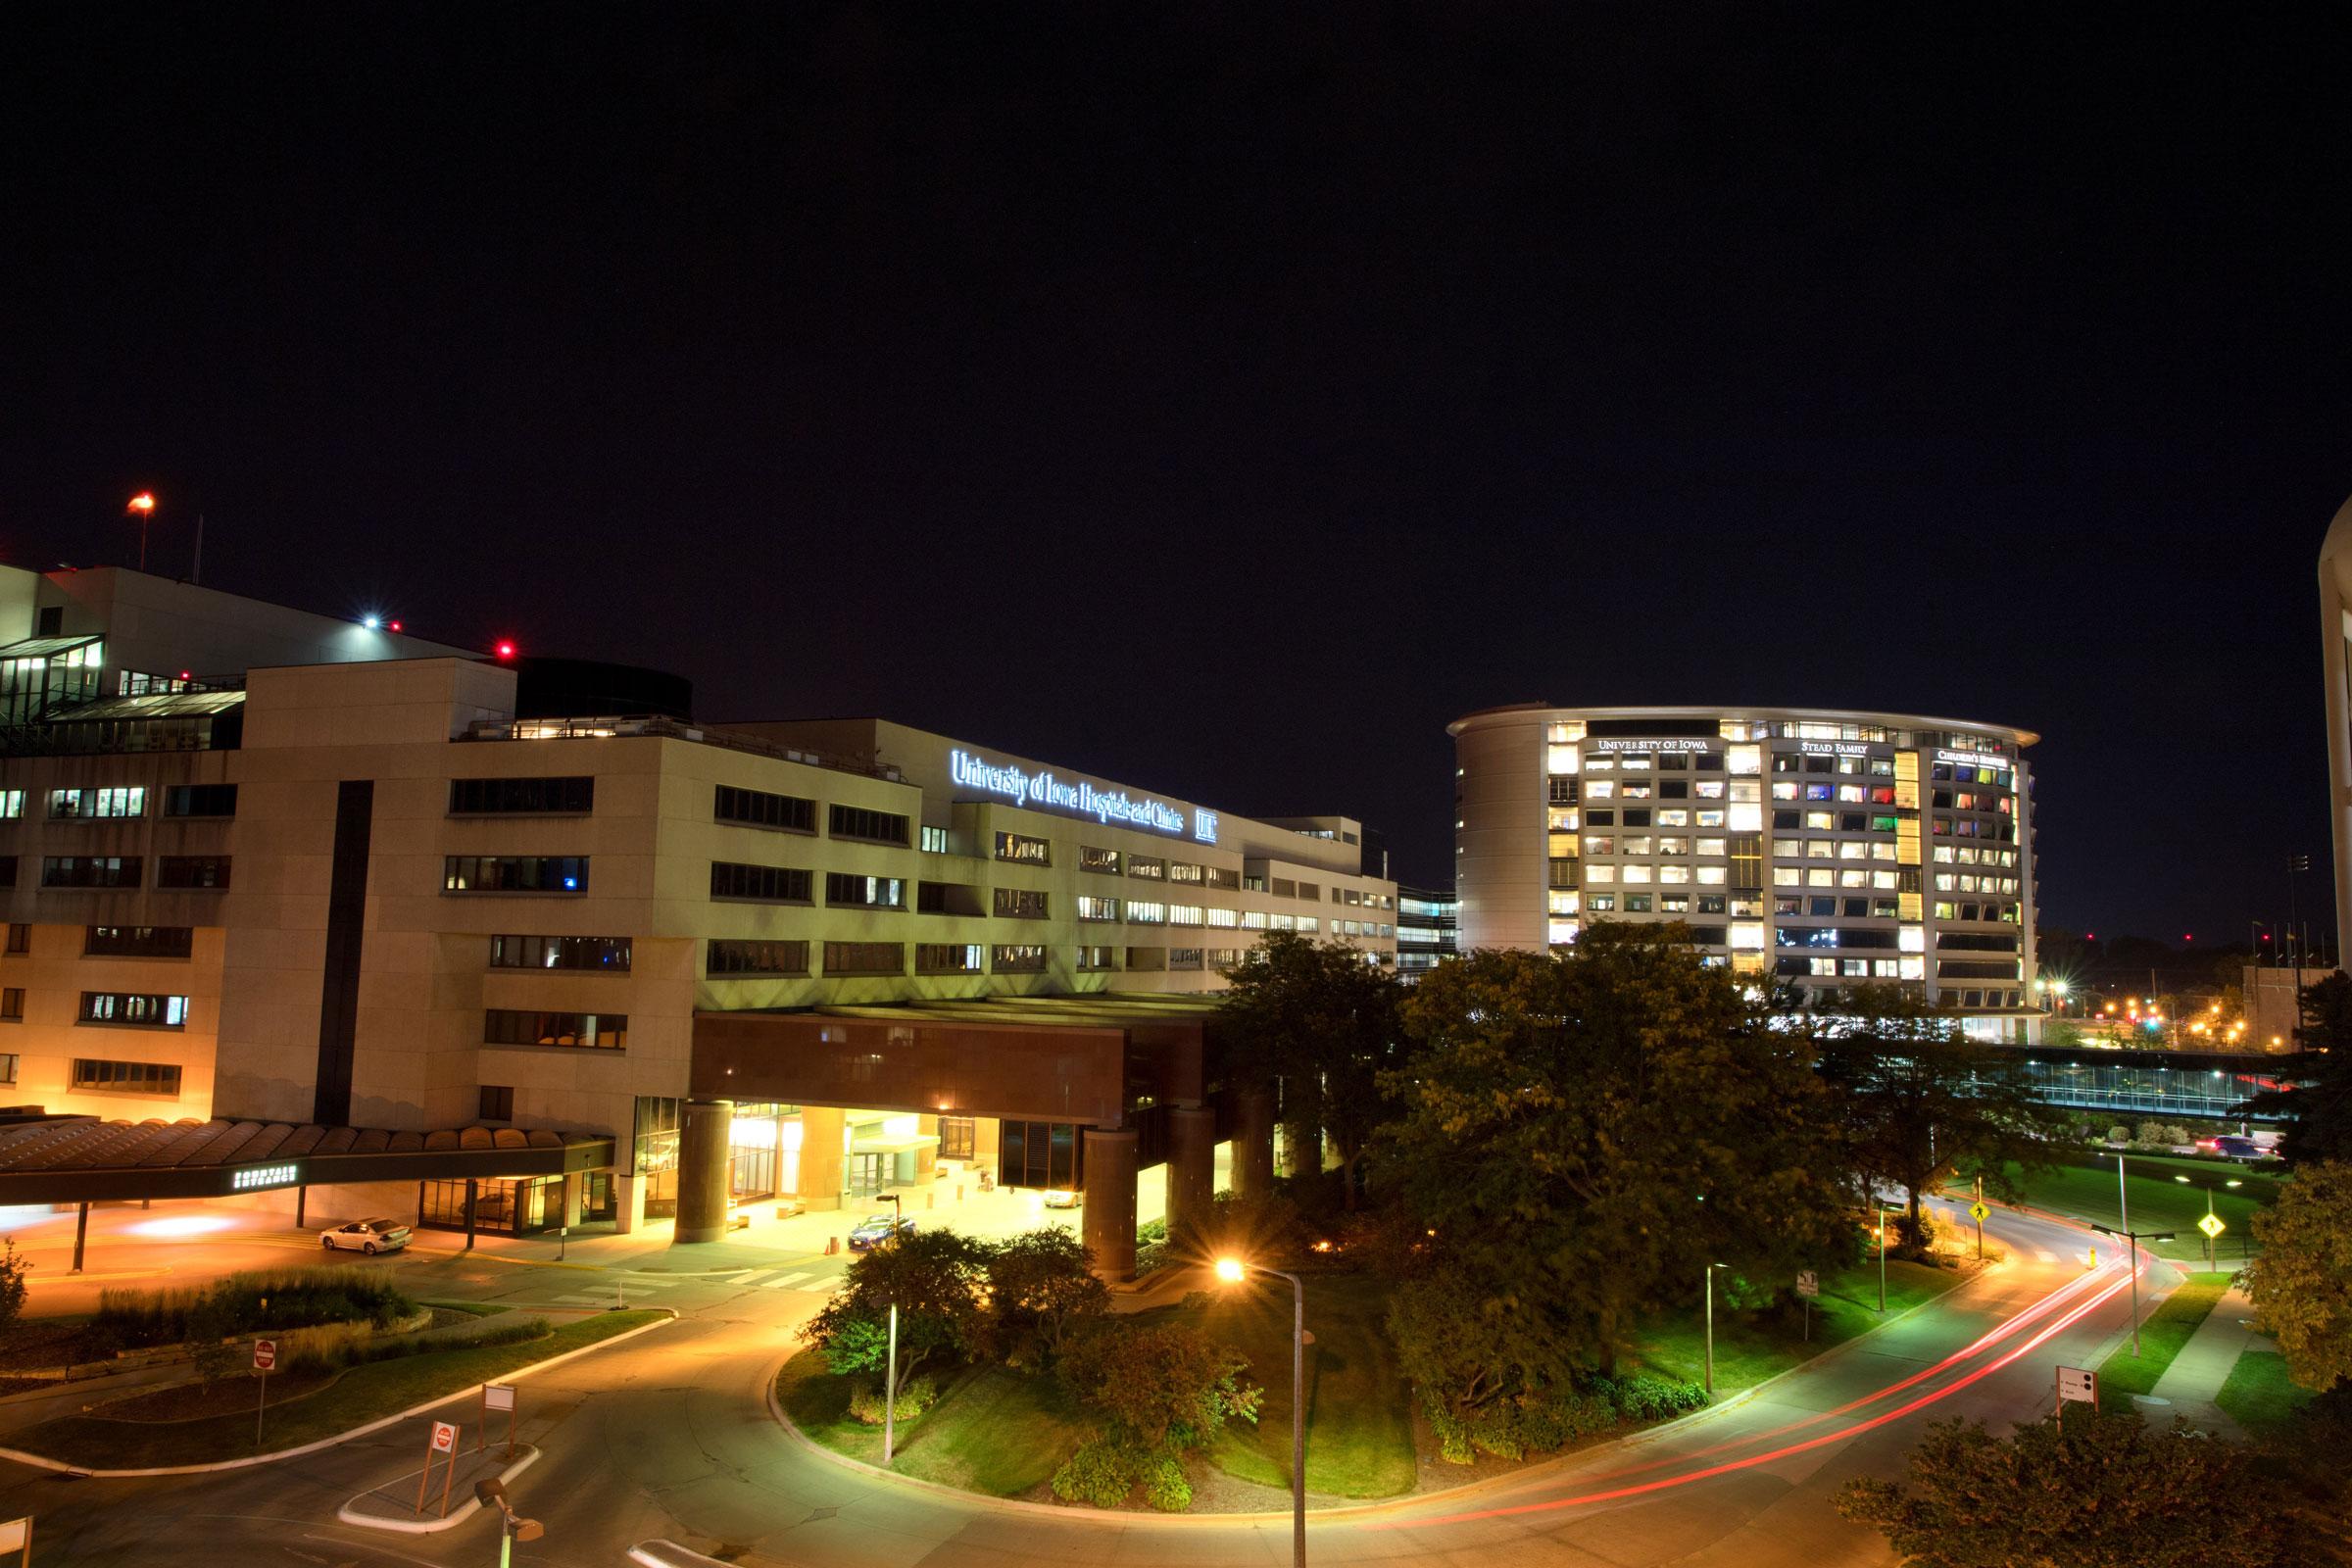 University of Iowa Hospital and Clinic at night